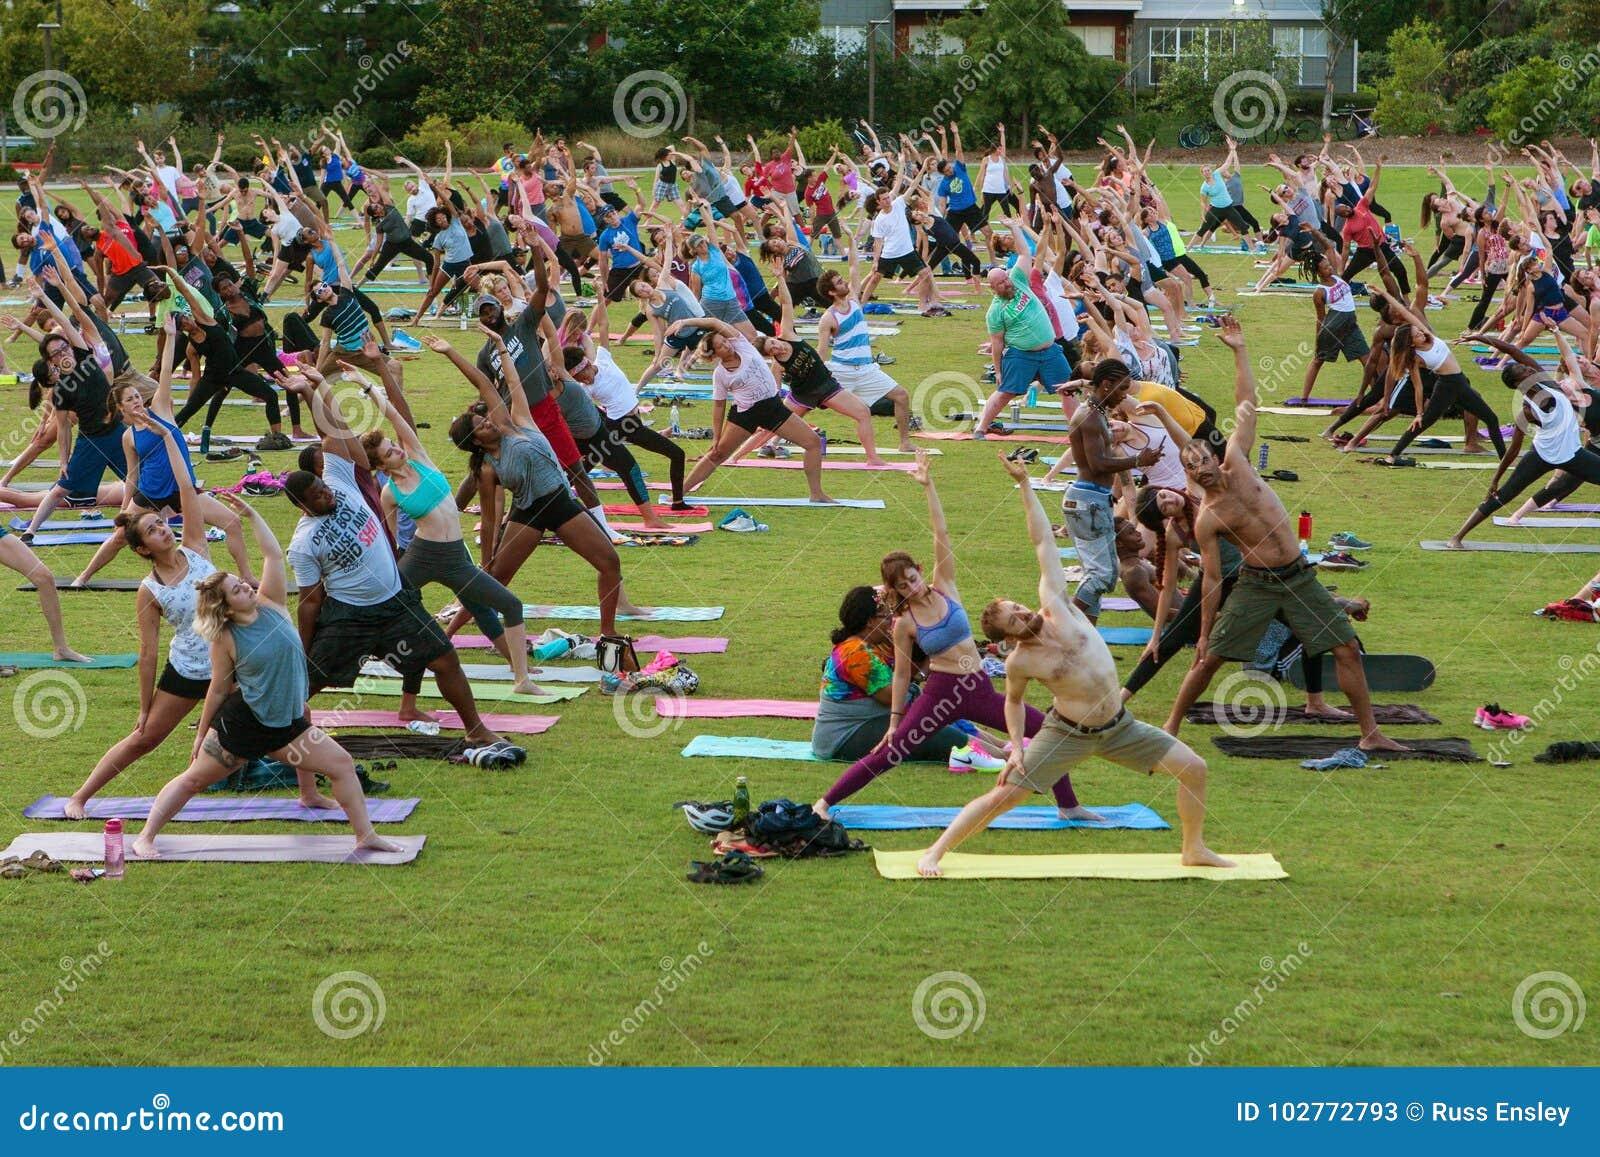 Dozens Of People Stretch At Free Outdoor Atlanta Yoga Class Editorial Stock Photo Image Of Flexibility Dozens 102772793